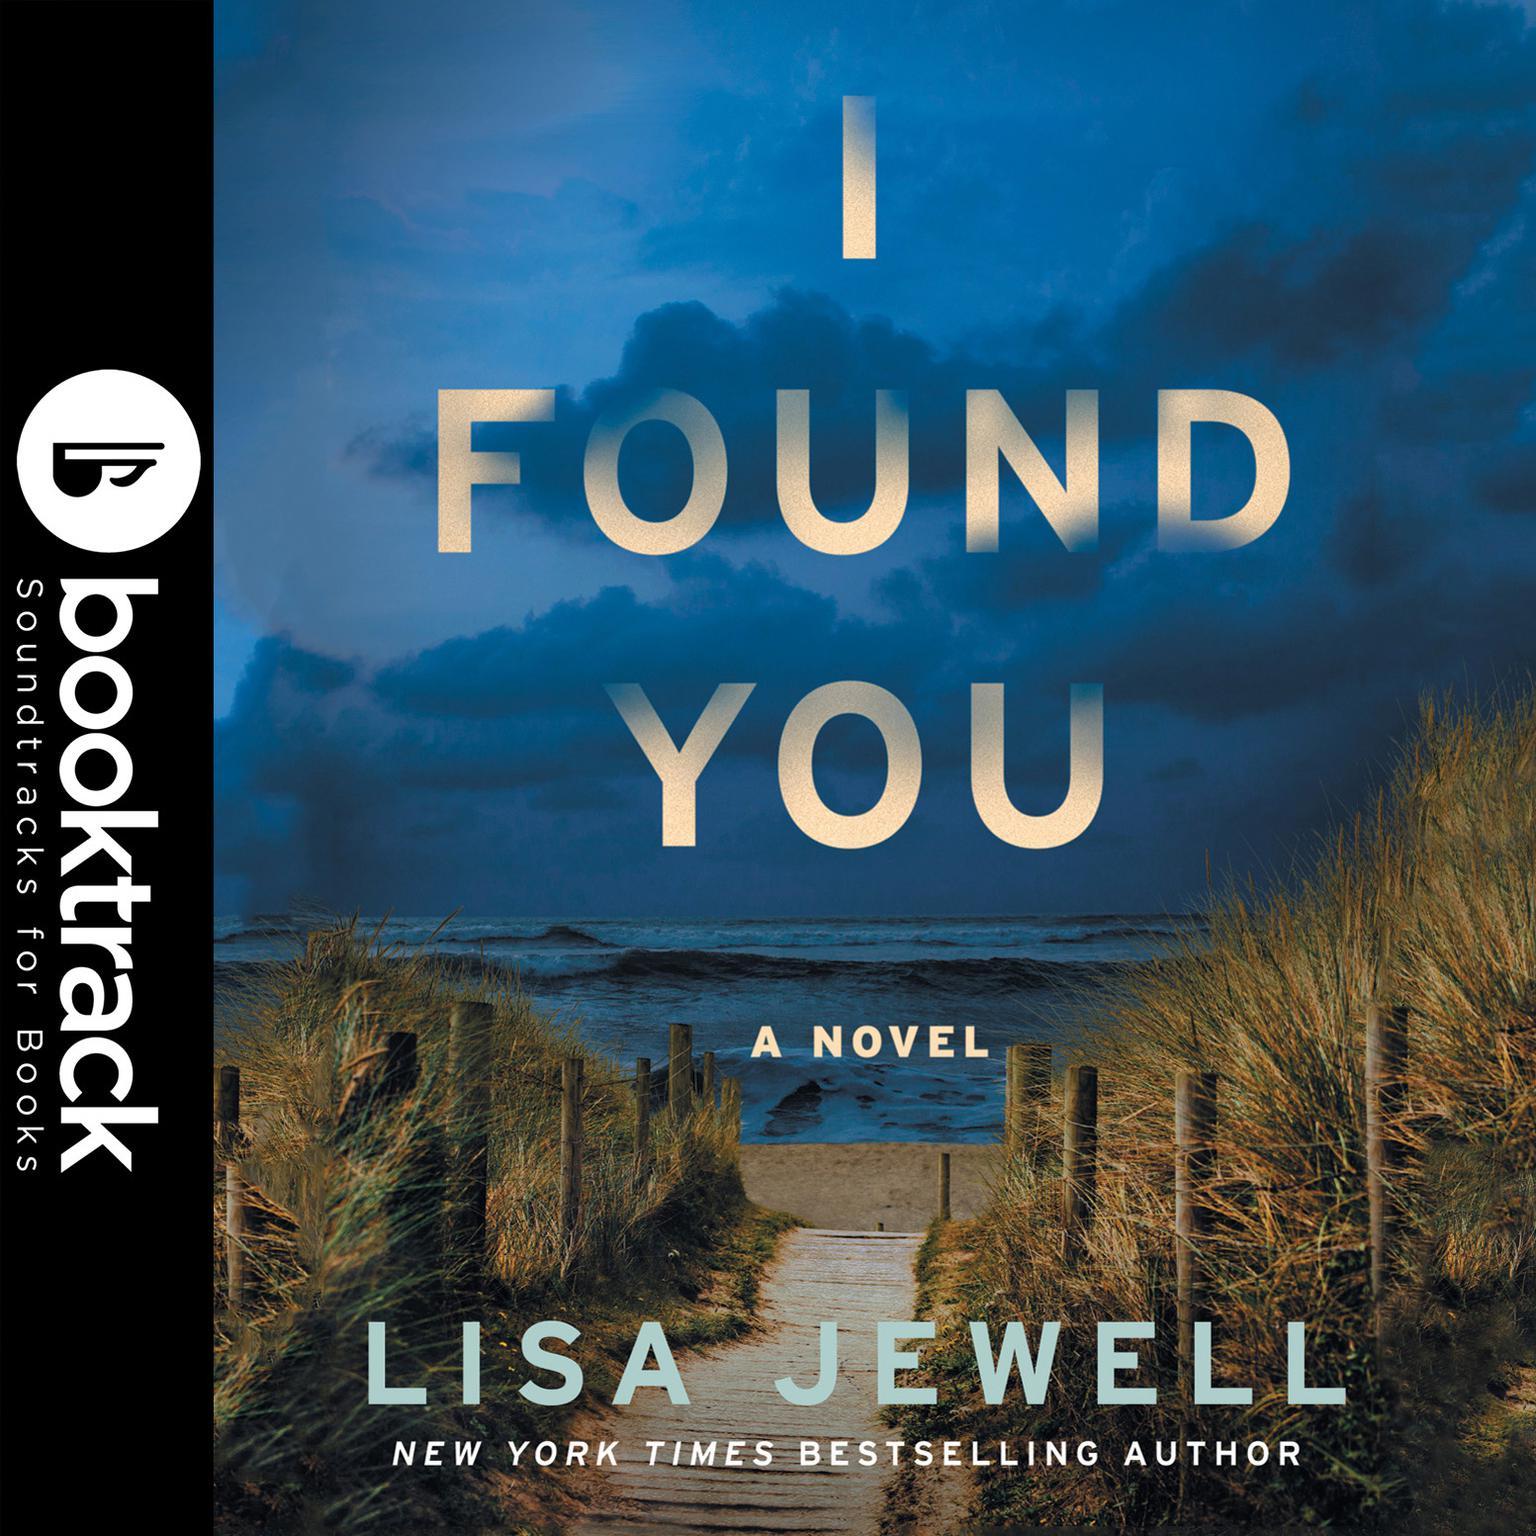 Printable I Found You - Booktrack Edition Audiobook Cover Art